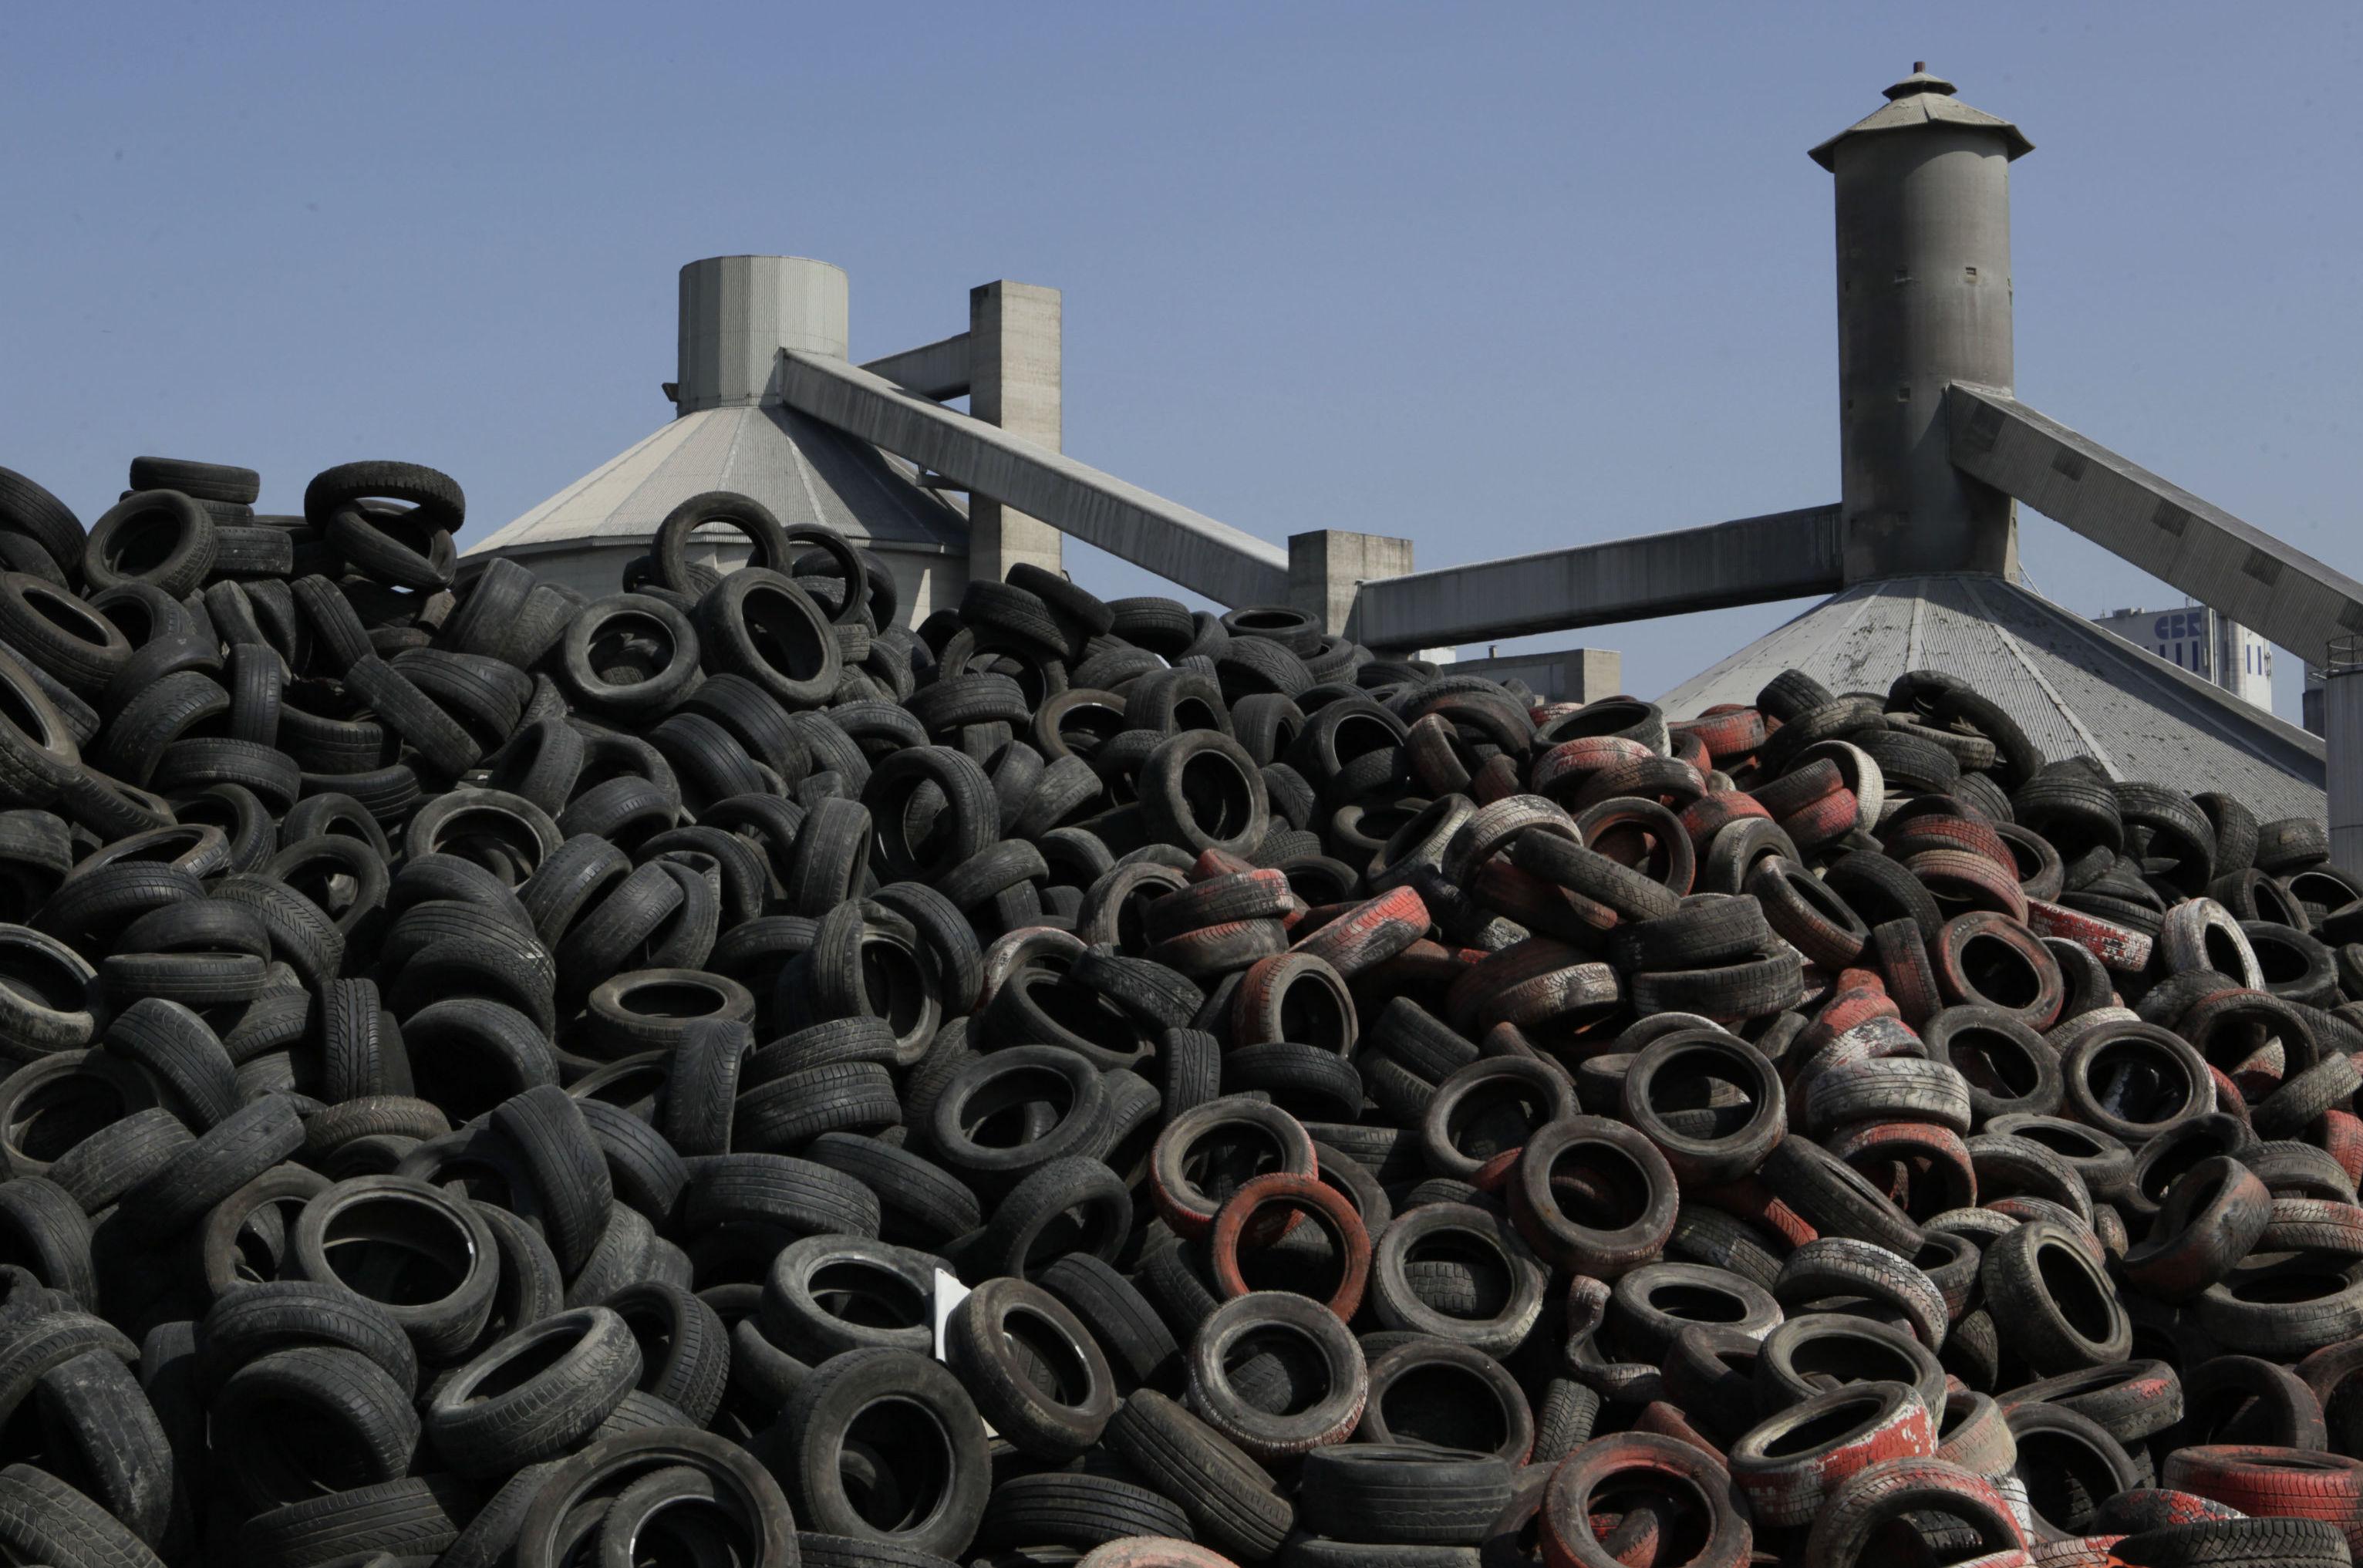 Todas estas montañas se neumáticos usados se utilizan como combustible para producir clínker en una planta productora de cemento de Lixhe, en Bélgica.